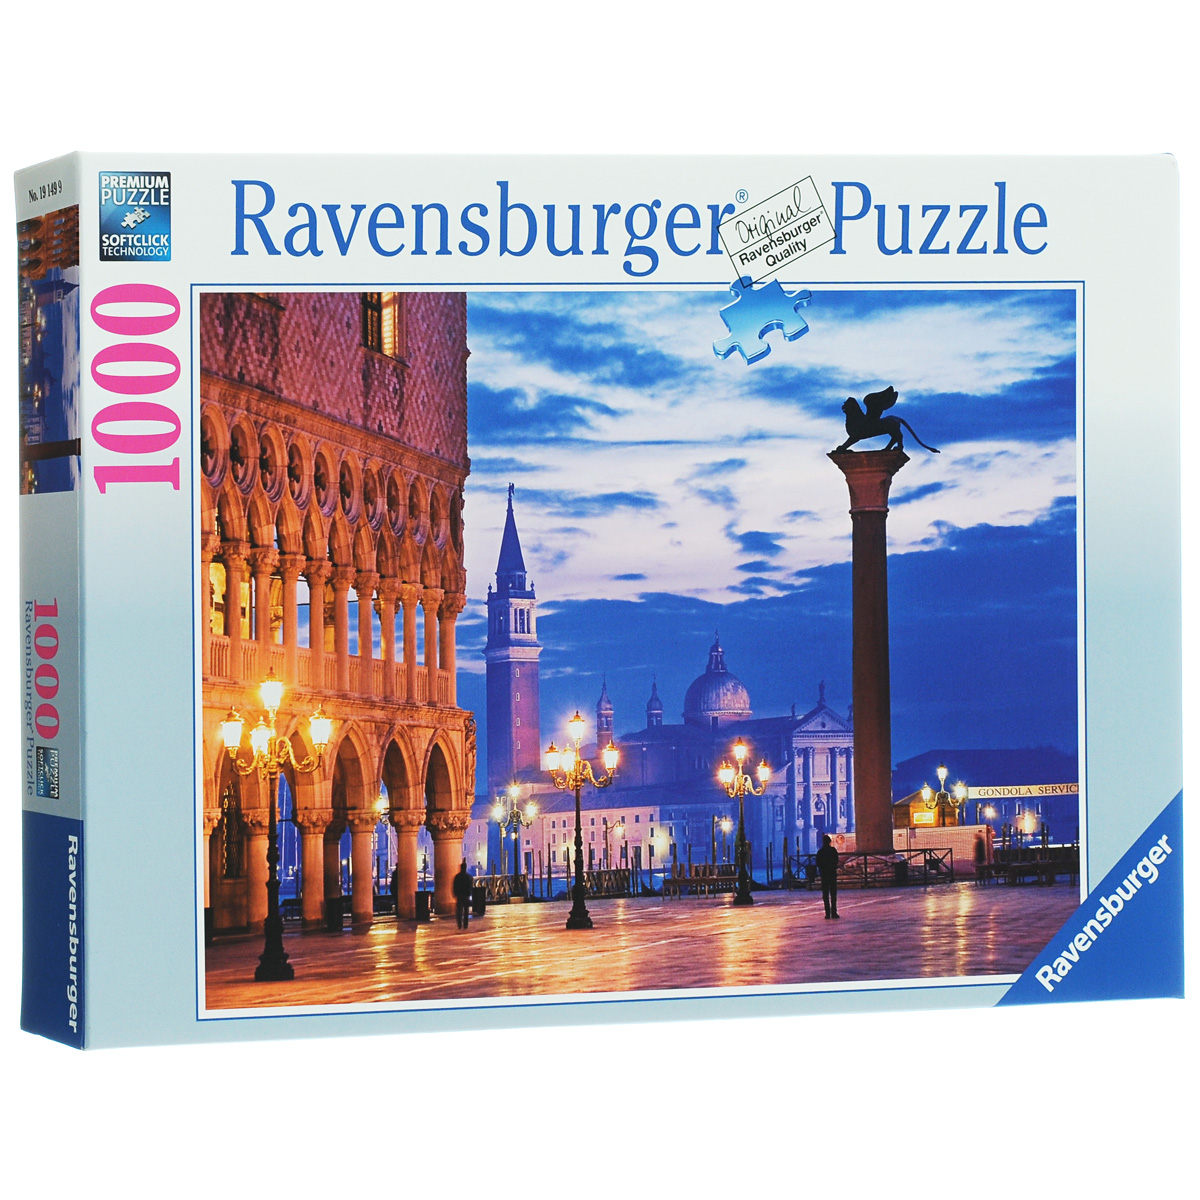 Ravensburger Площадь Сан-Марко. Пазл, 1000 элементов